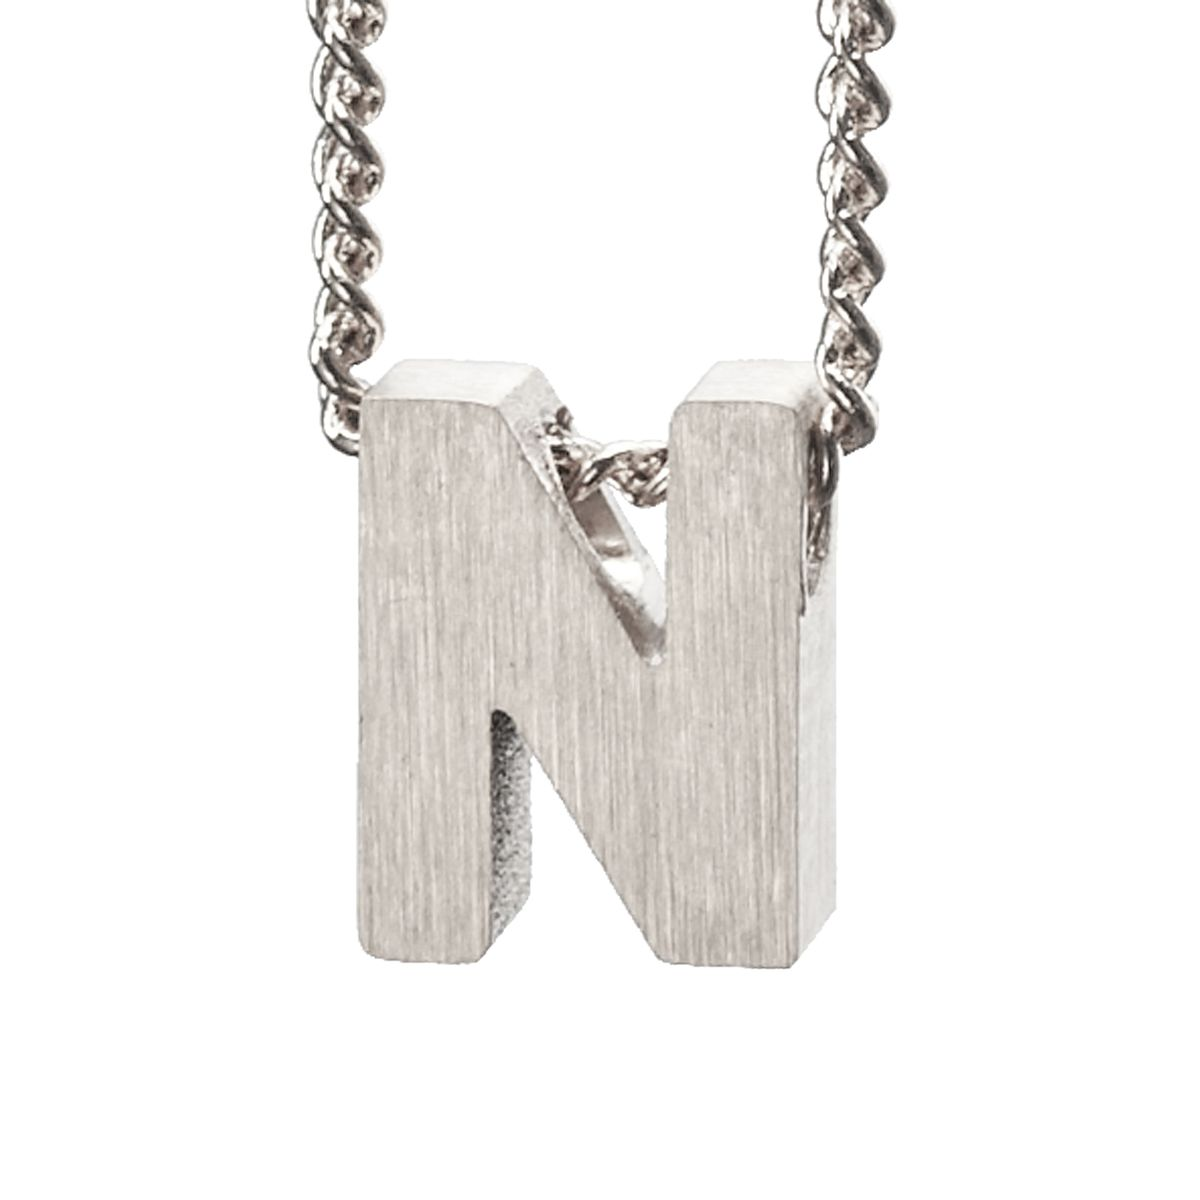 Breloque lettre N - argenté (Maat Onesize) - LUZ - Modalova